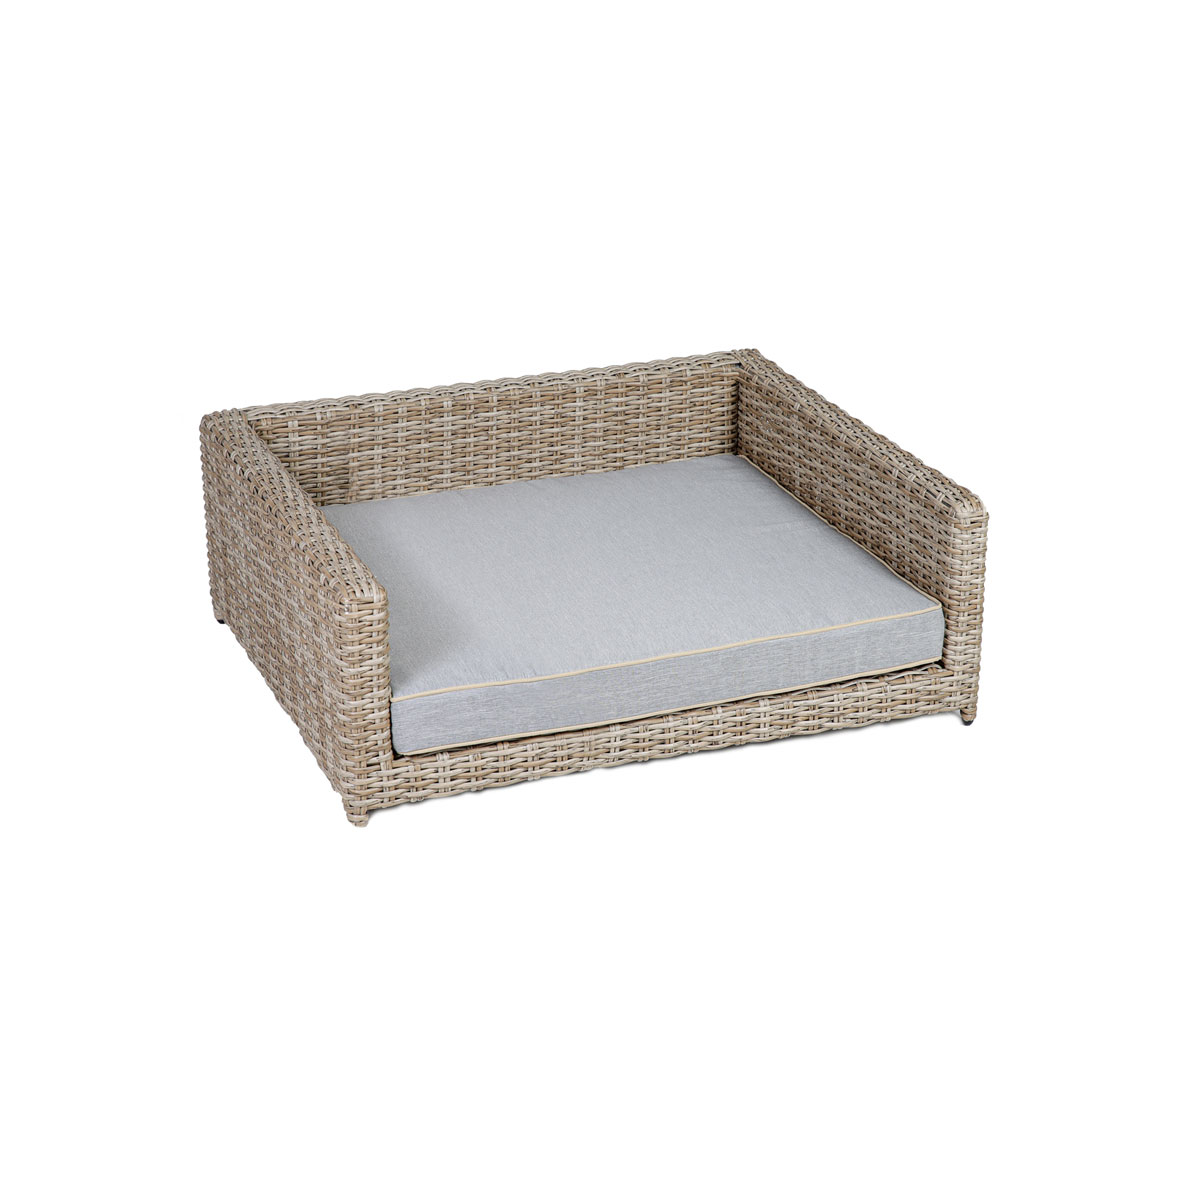 greenmotion pet Hunde-Couch M 80x60x30 cm, Rattanoptik beige